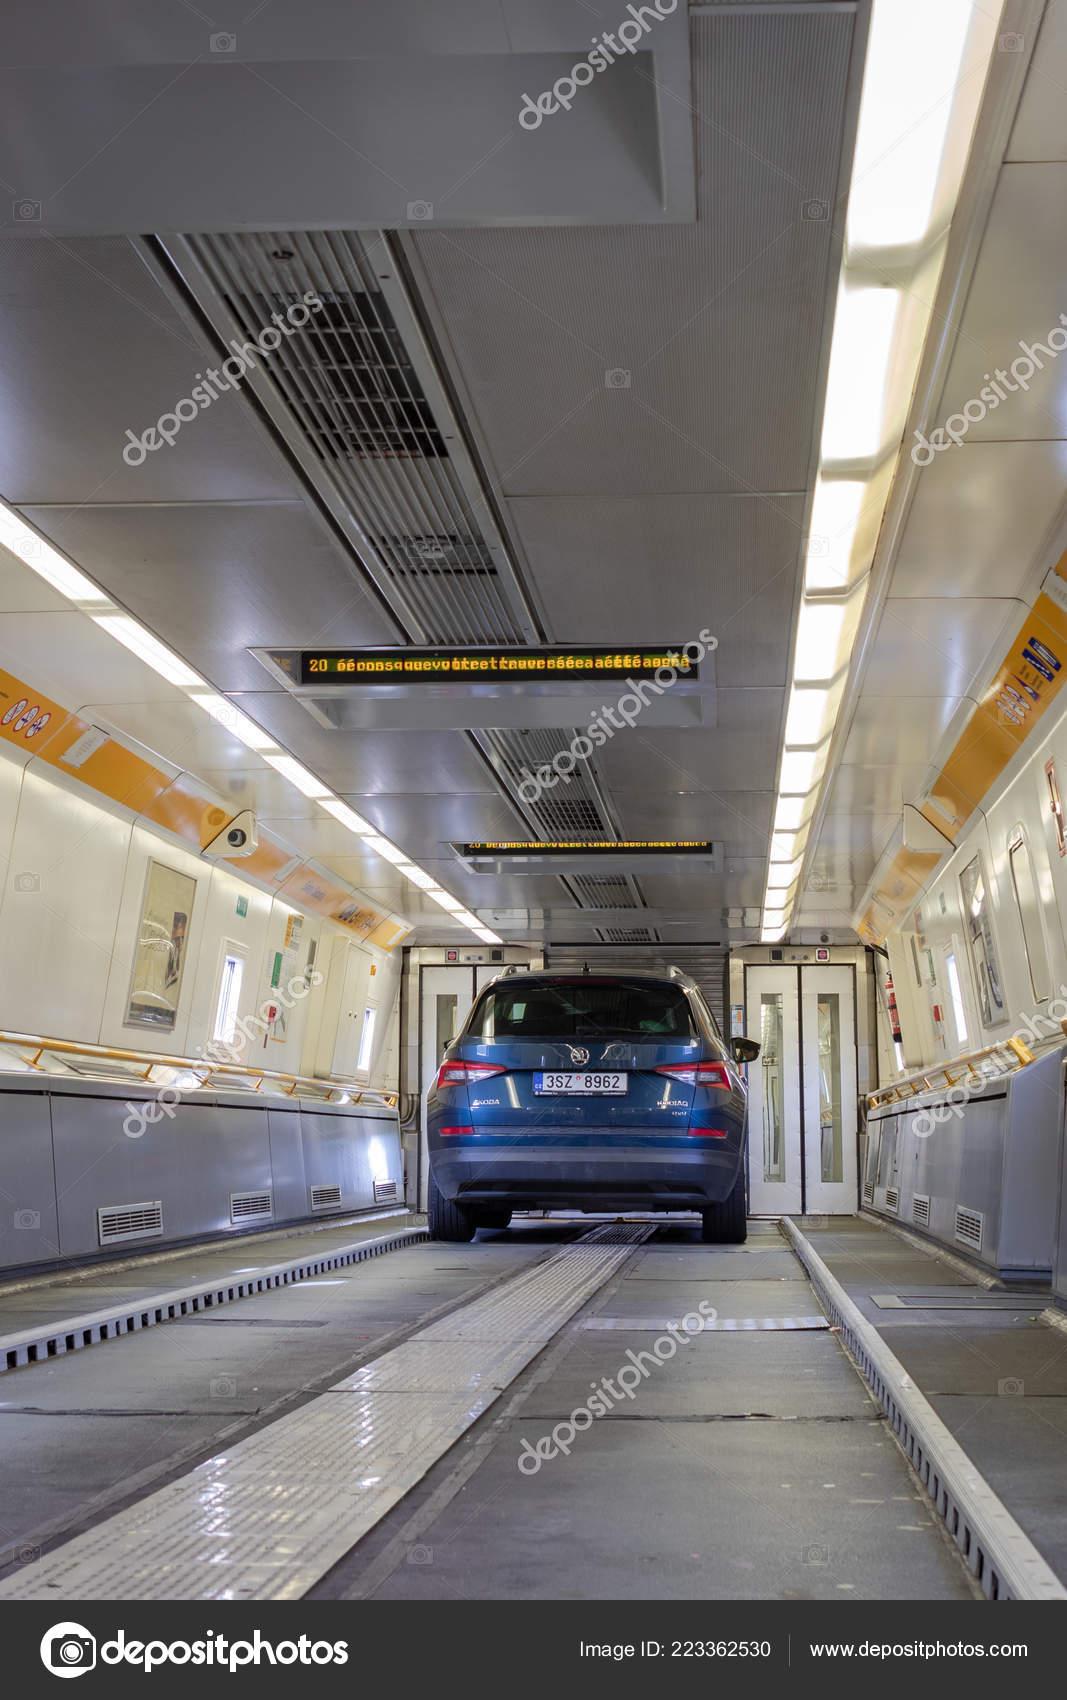 Eurotunnel Trein Frankrijk Verenigd Koninkrijk Juli 2018